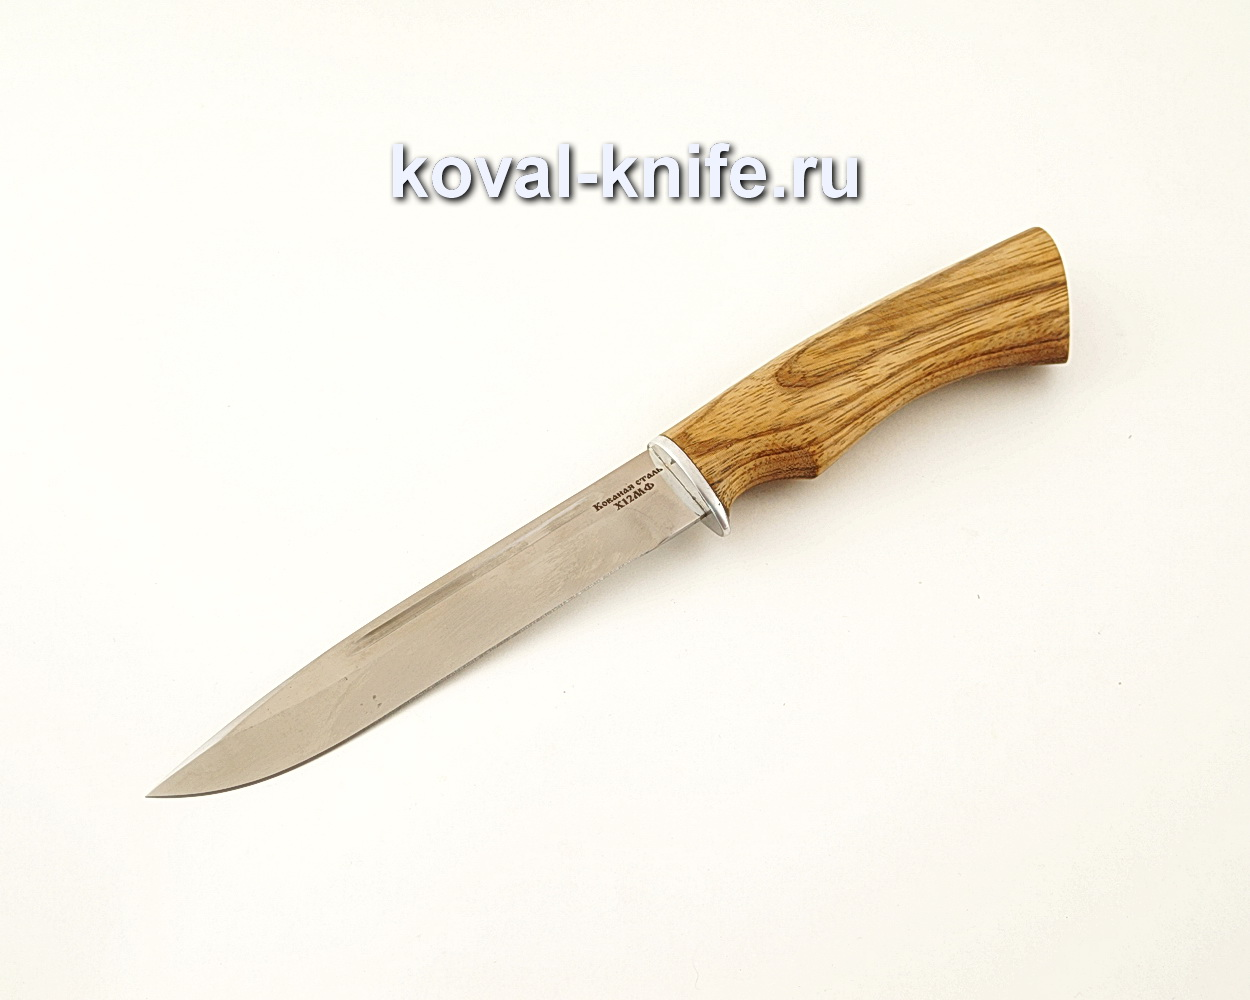 Нож Вишня из кованой стали Х12МФ с рукоятью из зебрано  A636